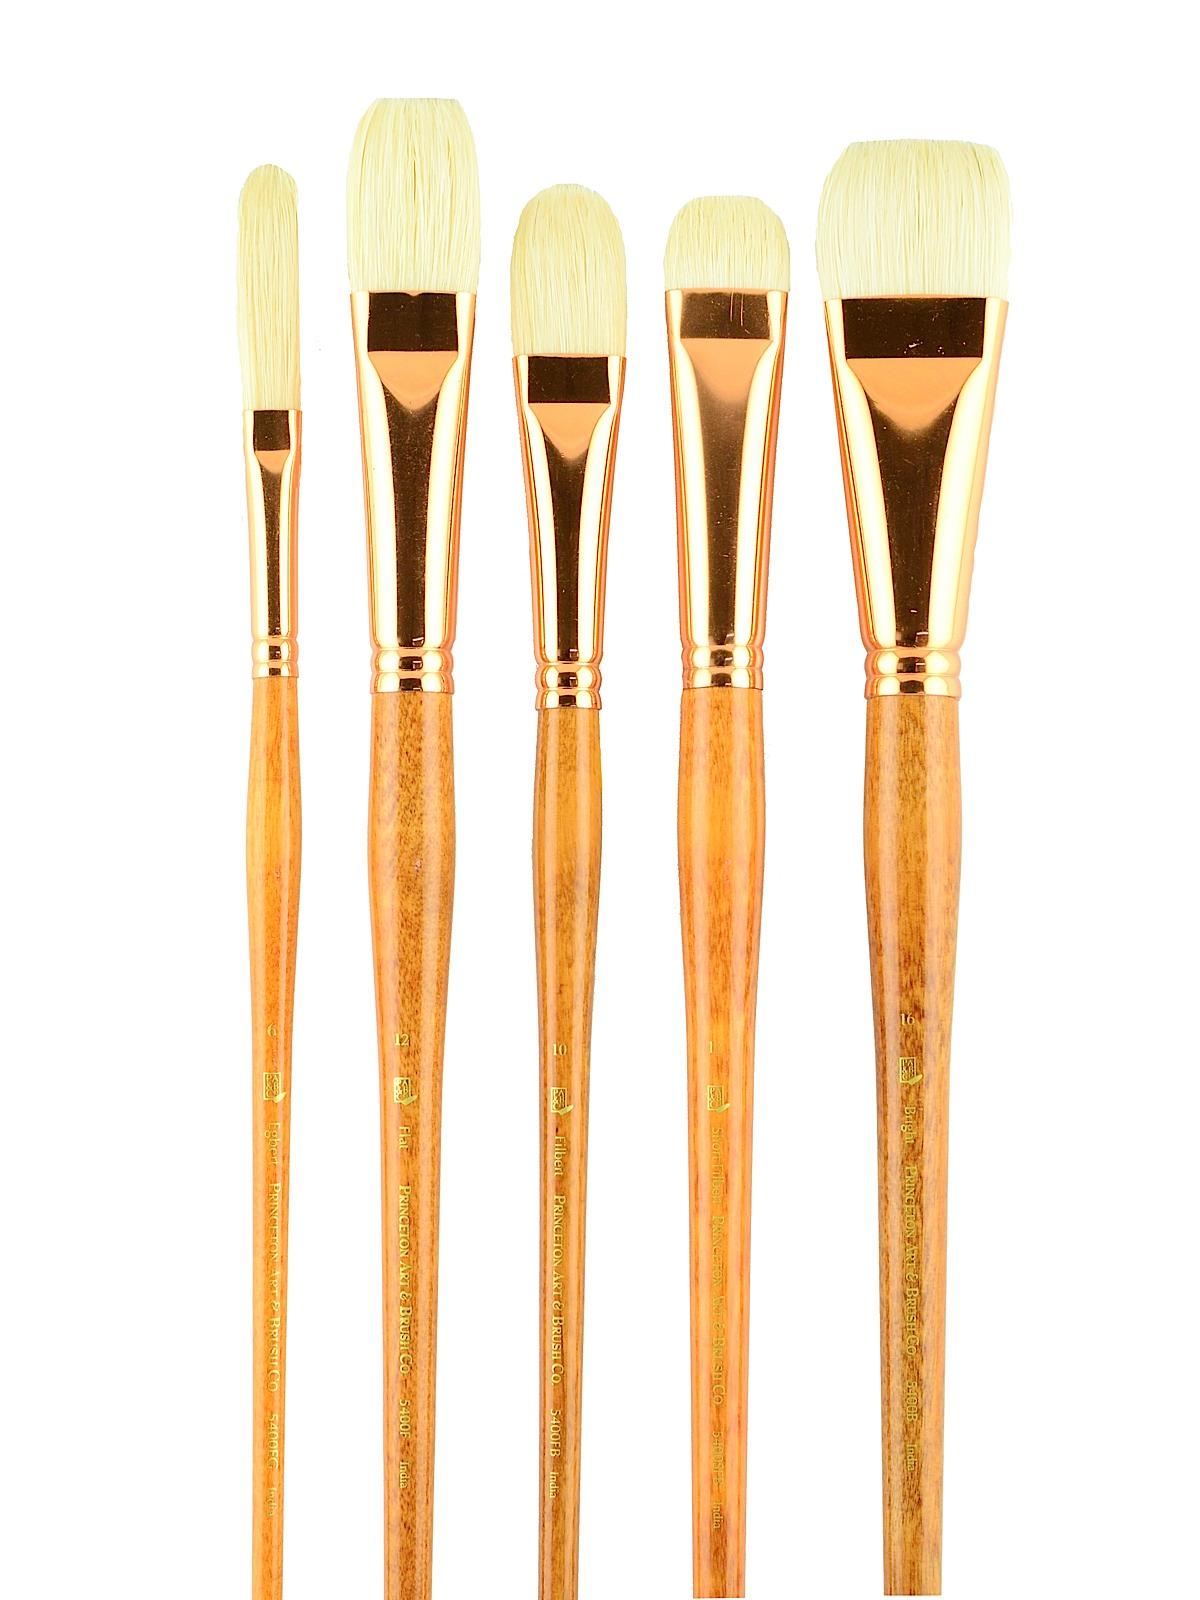 Series 5400 Refine Bristle Long Handle Brushes